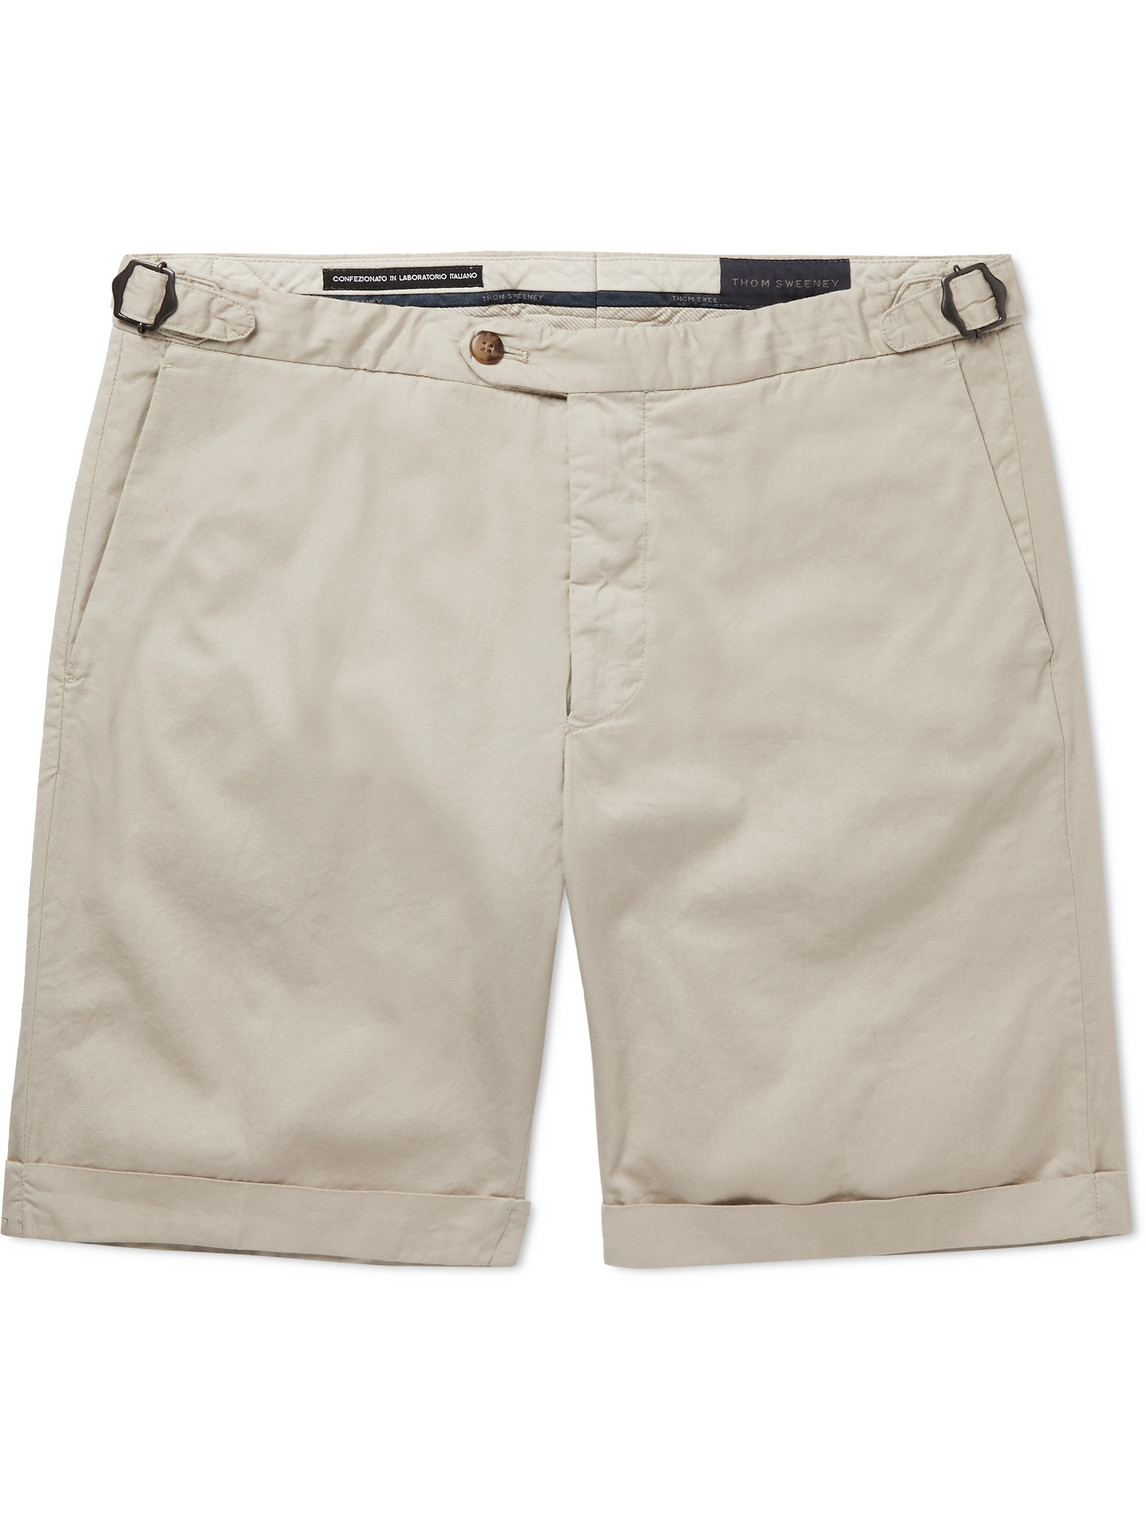 Thom Sweeney - Stretch-Cotton Twill Chino Shorts - Men - Neutrals - 46